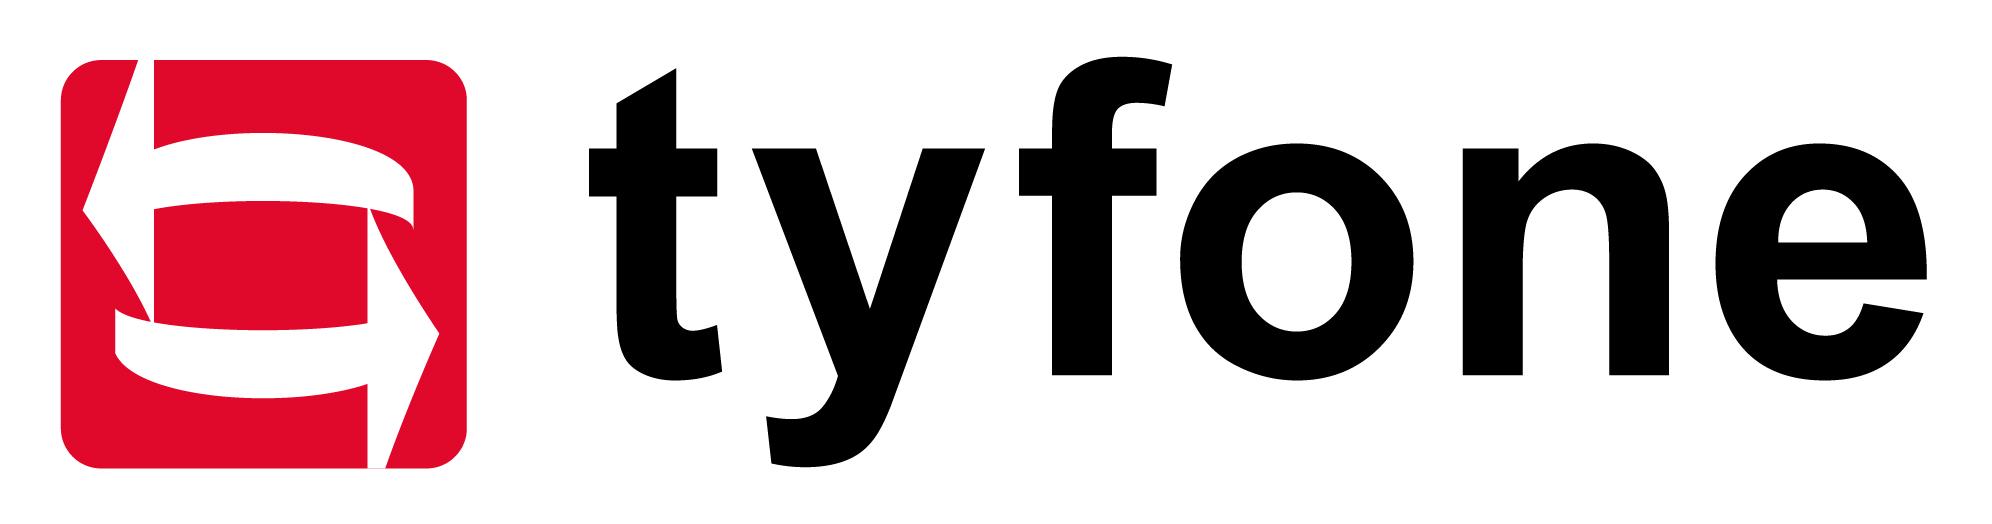 Tyfone logo blk txt wht bg